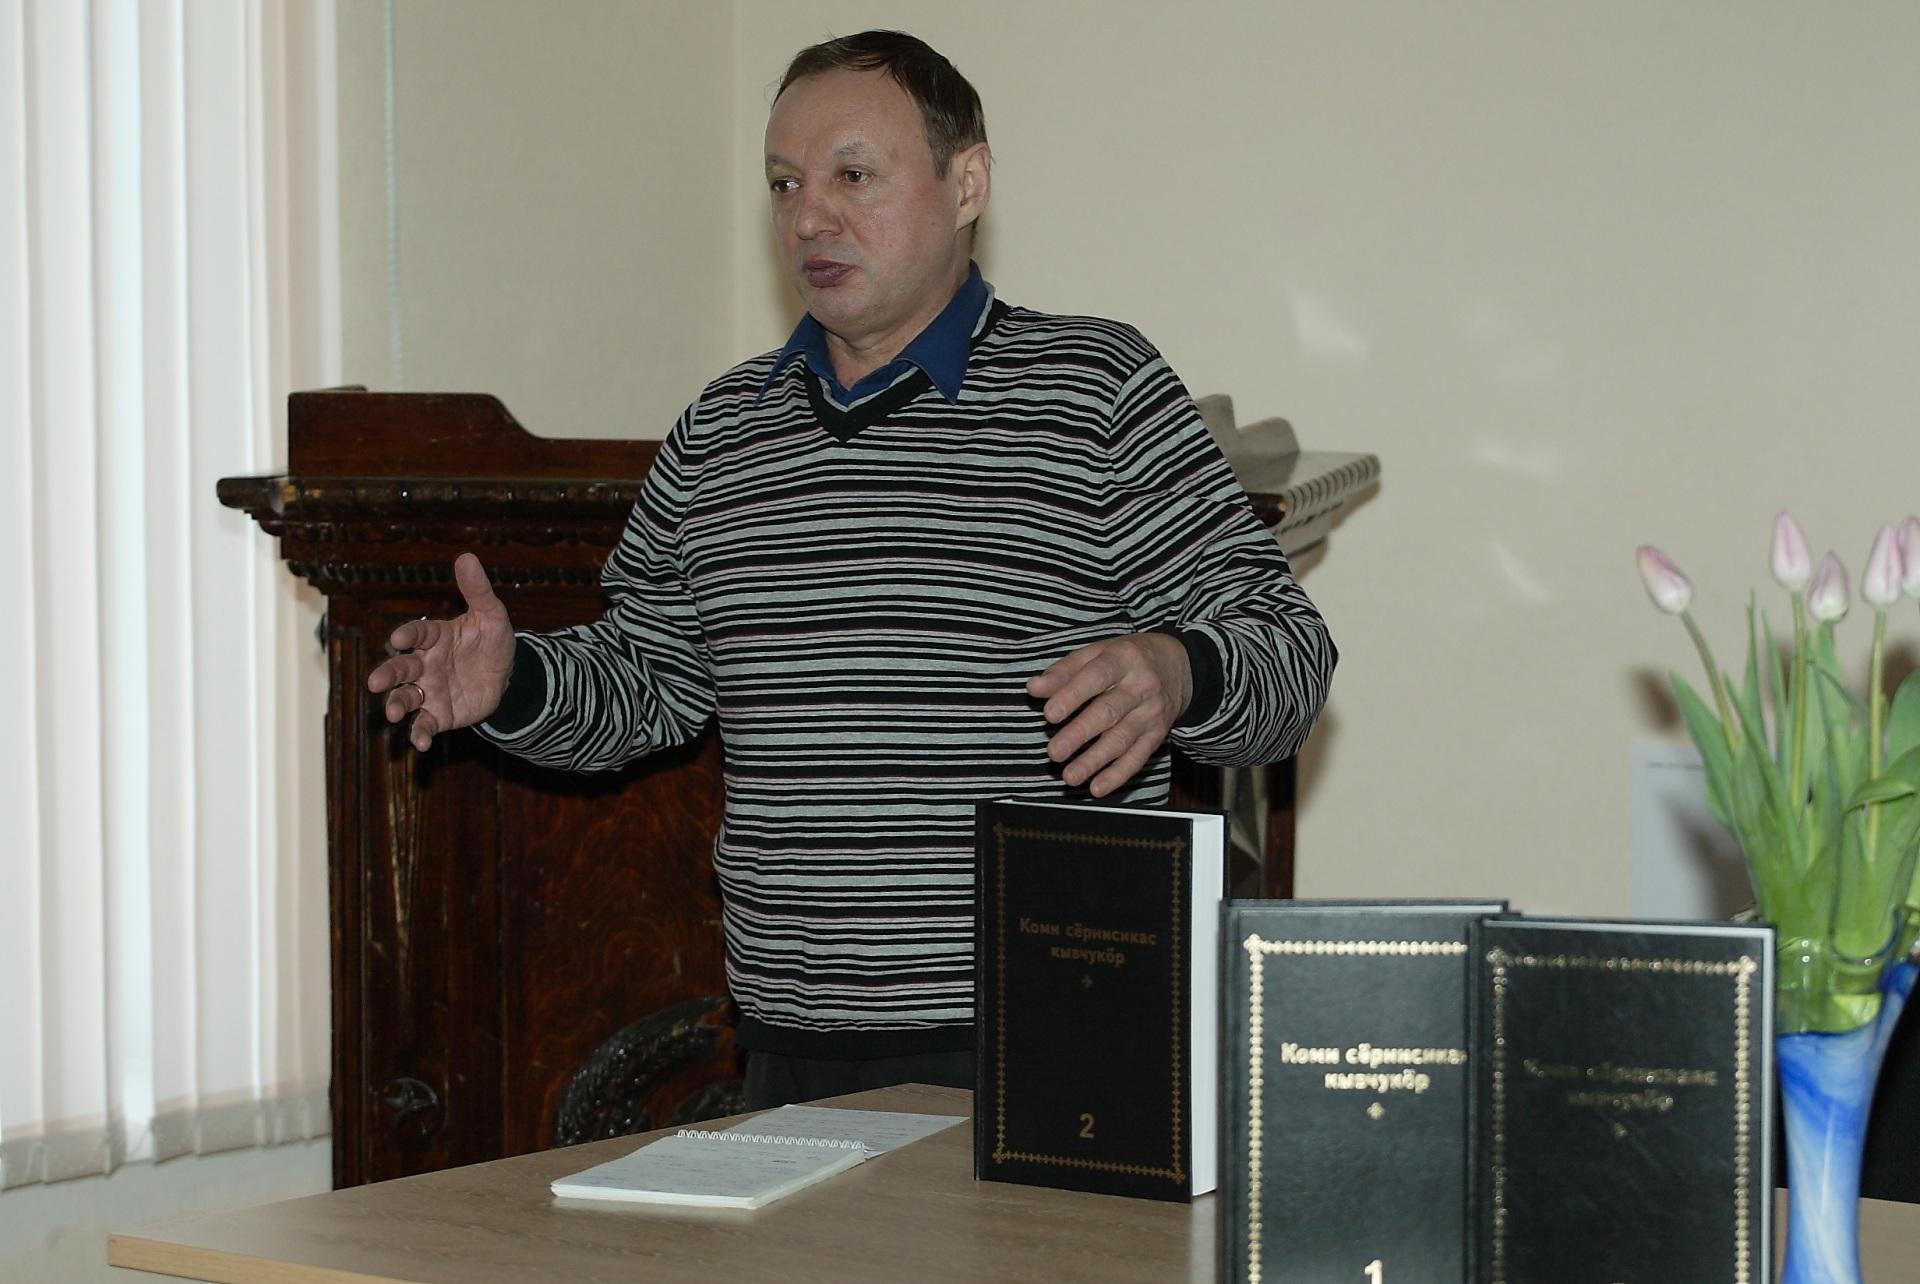 12---Na-prezentazii-dialektologicheskogo-slovarya-doktor-nauk-Zypanov-E.A..JPG